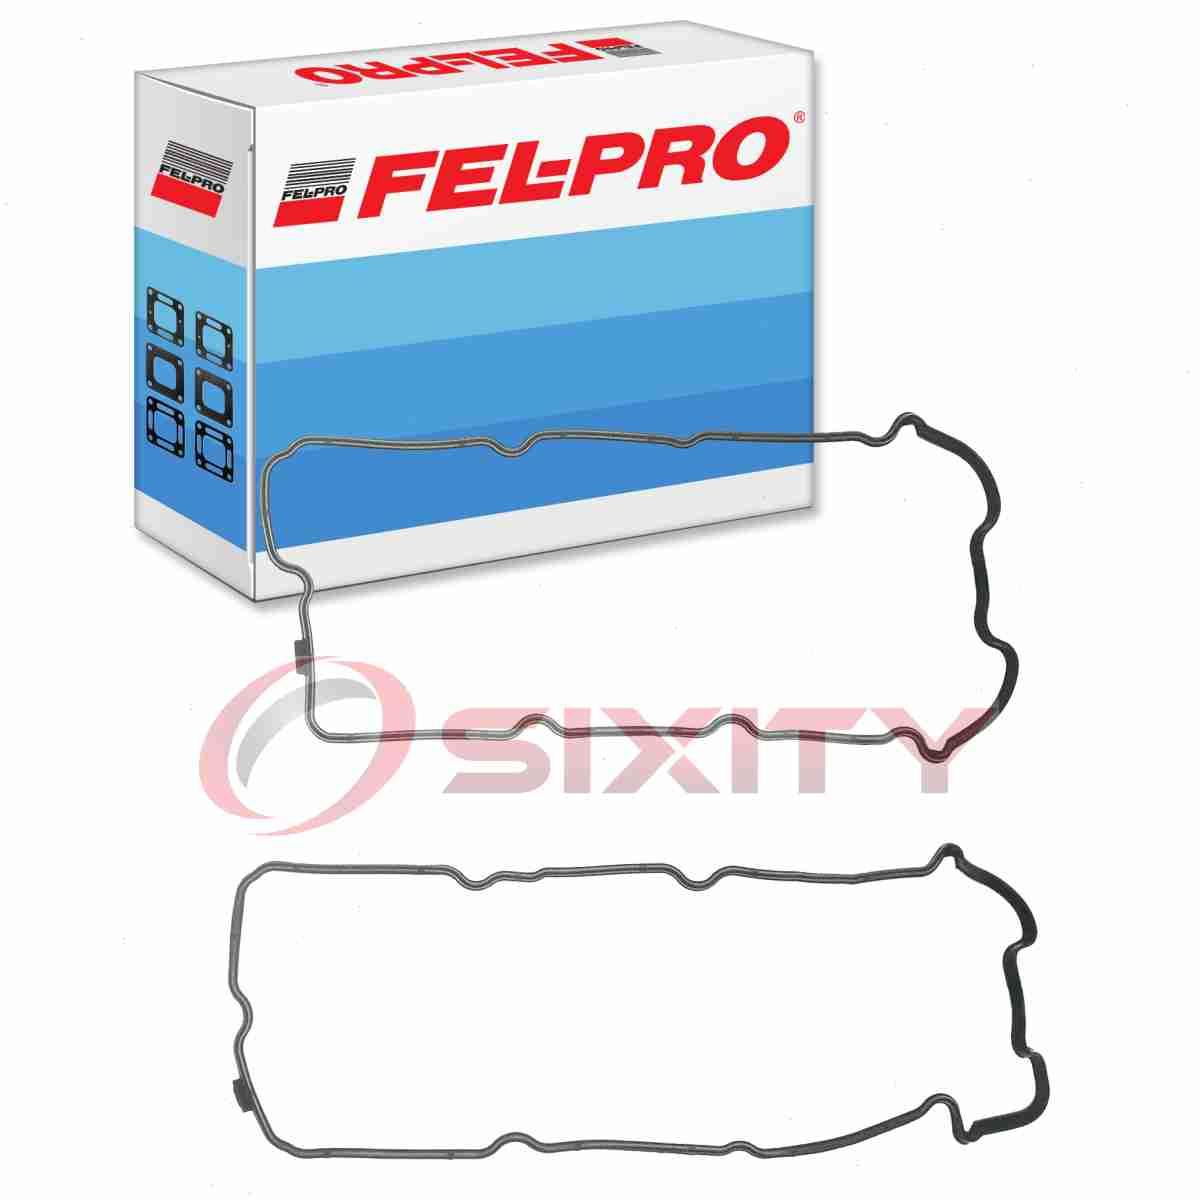 Fel-Pro VS 50530 R Valve Cover Gasket Set FelPro VS50530R Engine Sealing vk